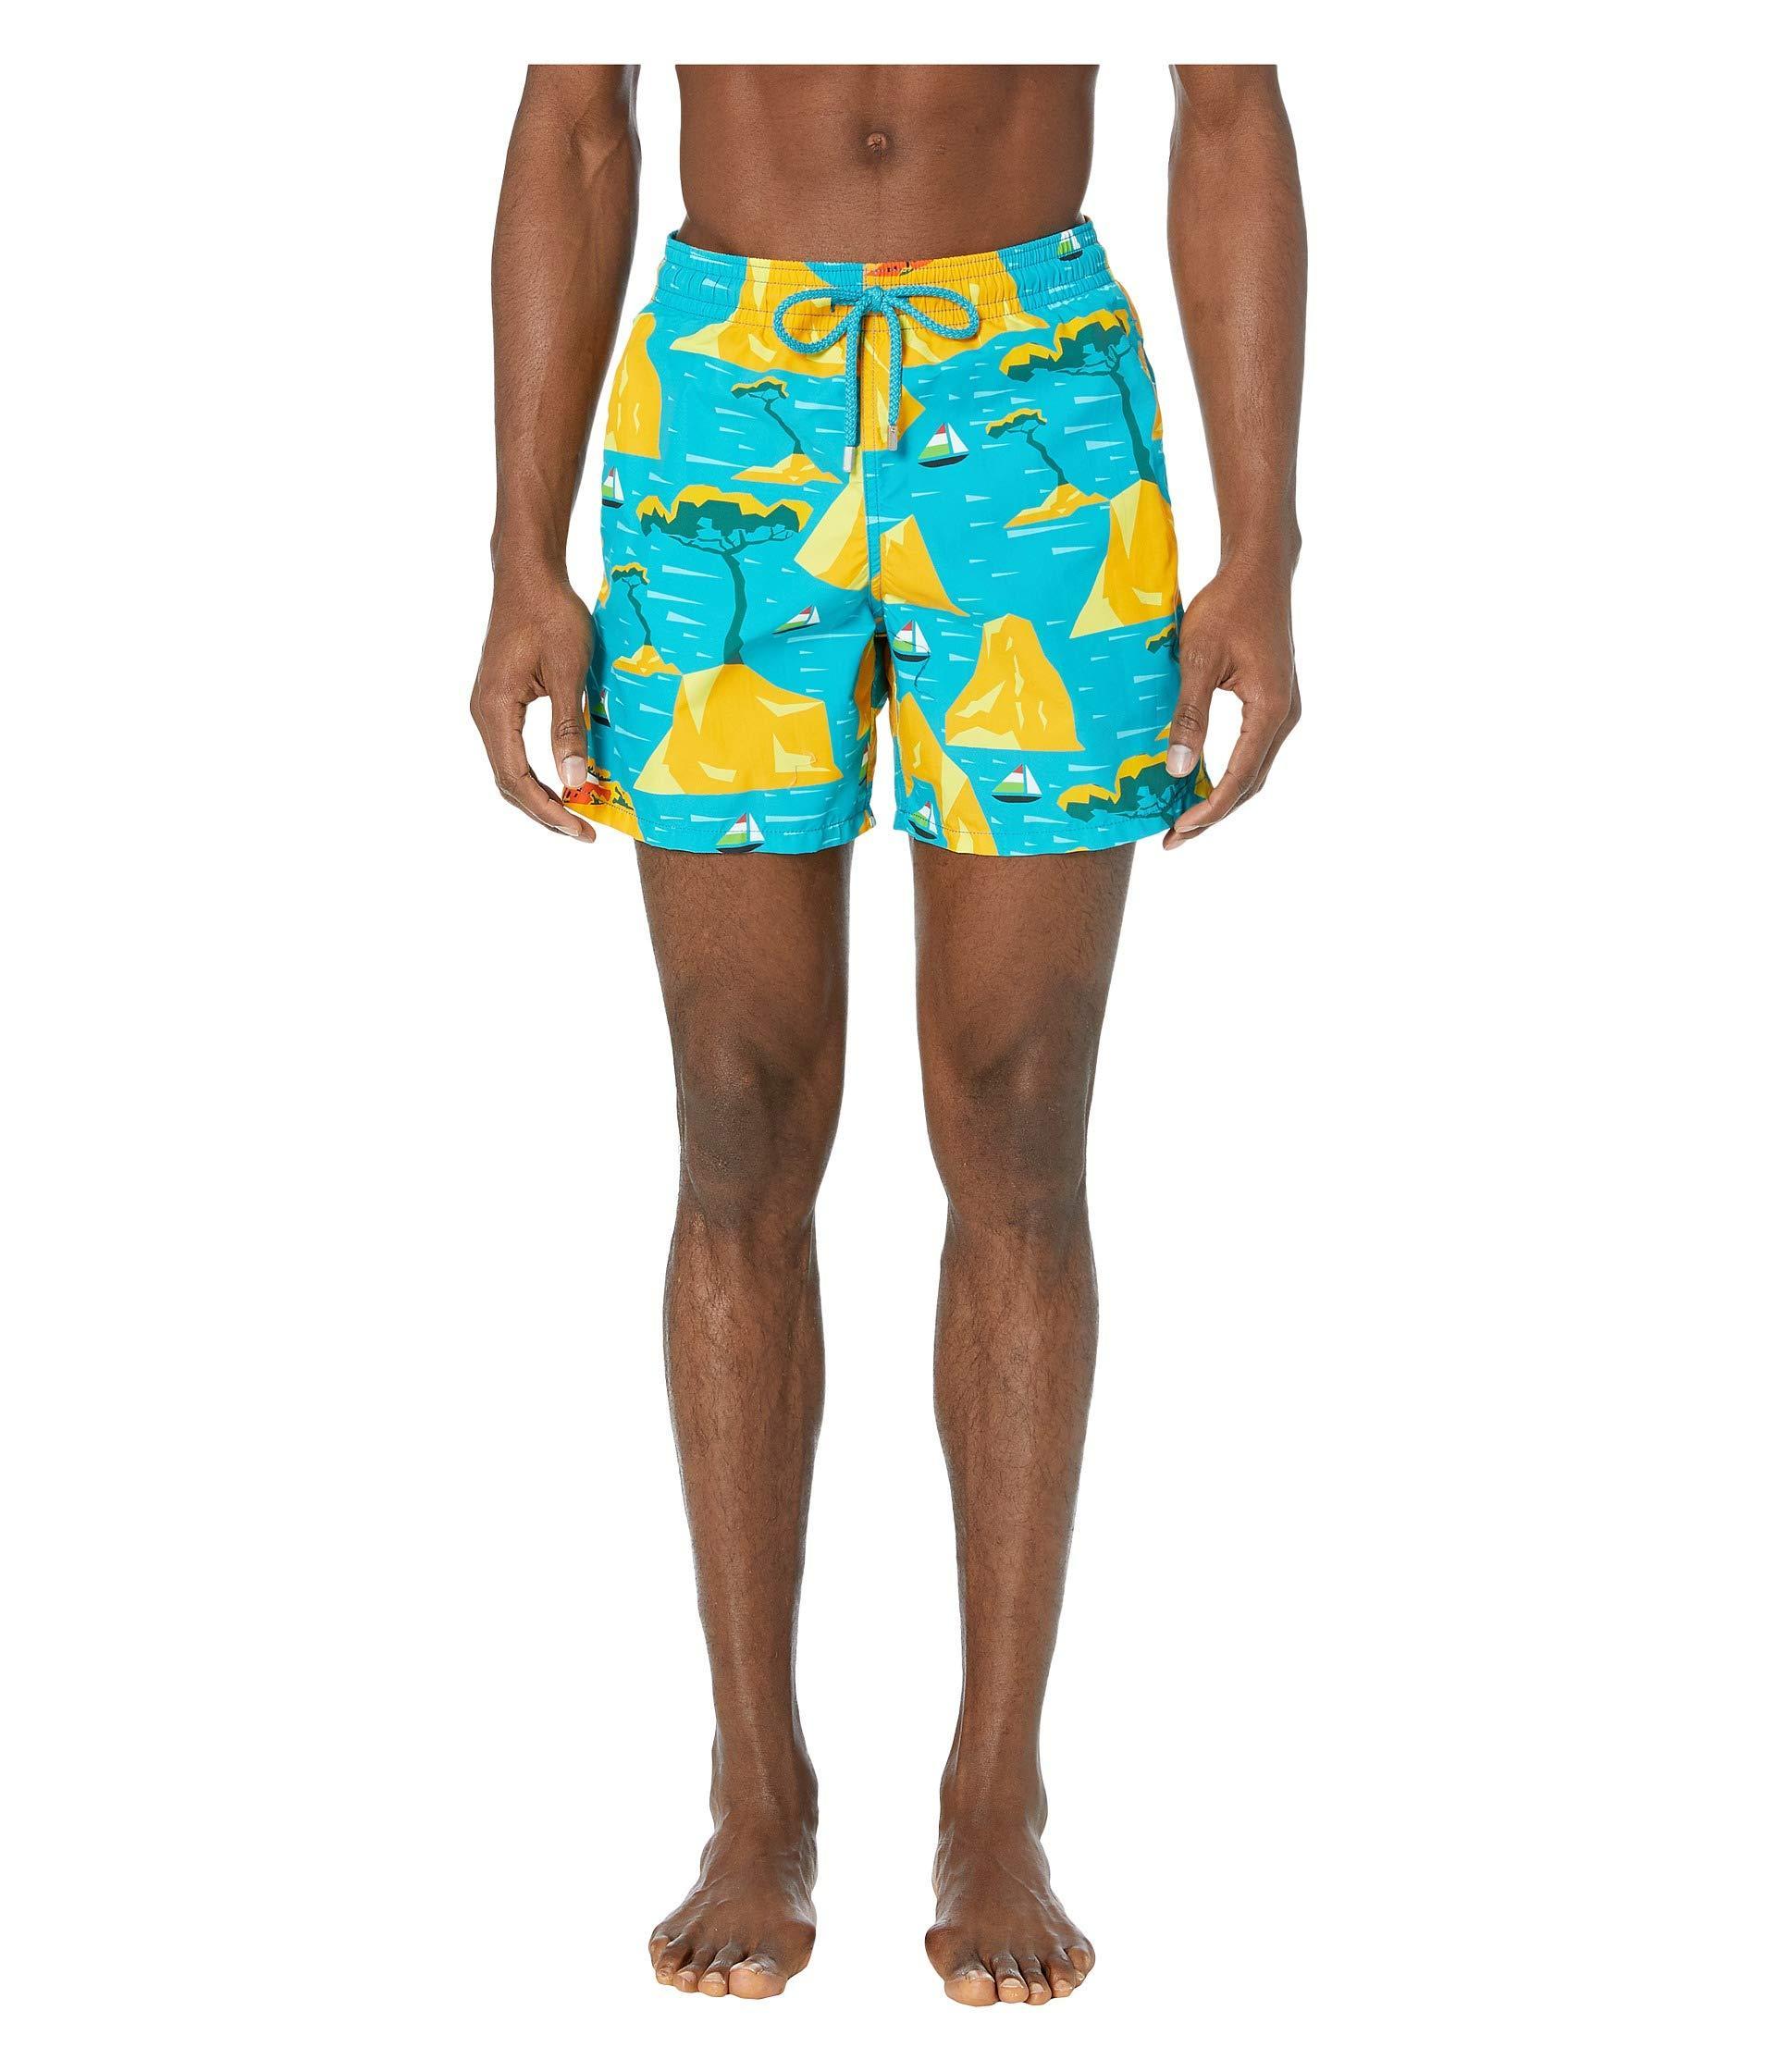 716d87498e Lyst - Vilebrequin Capri Moorea Swim Trunks (bahama Blue) Men's ...